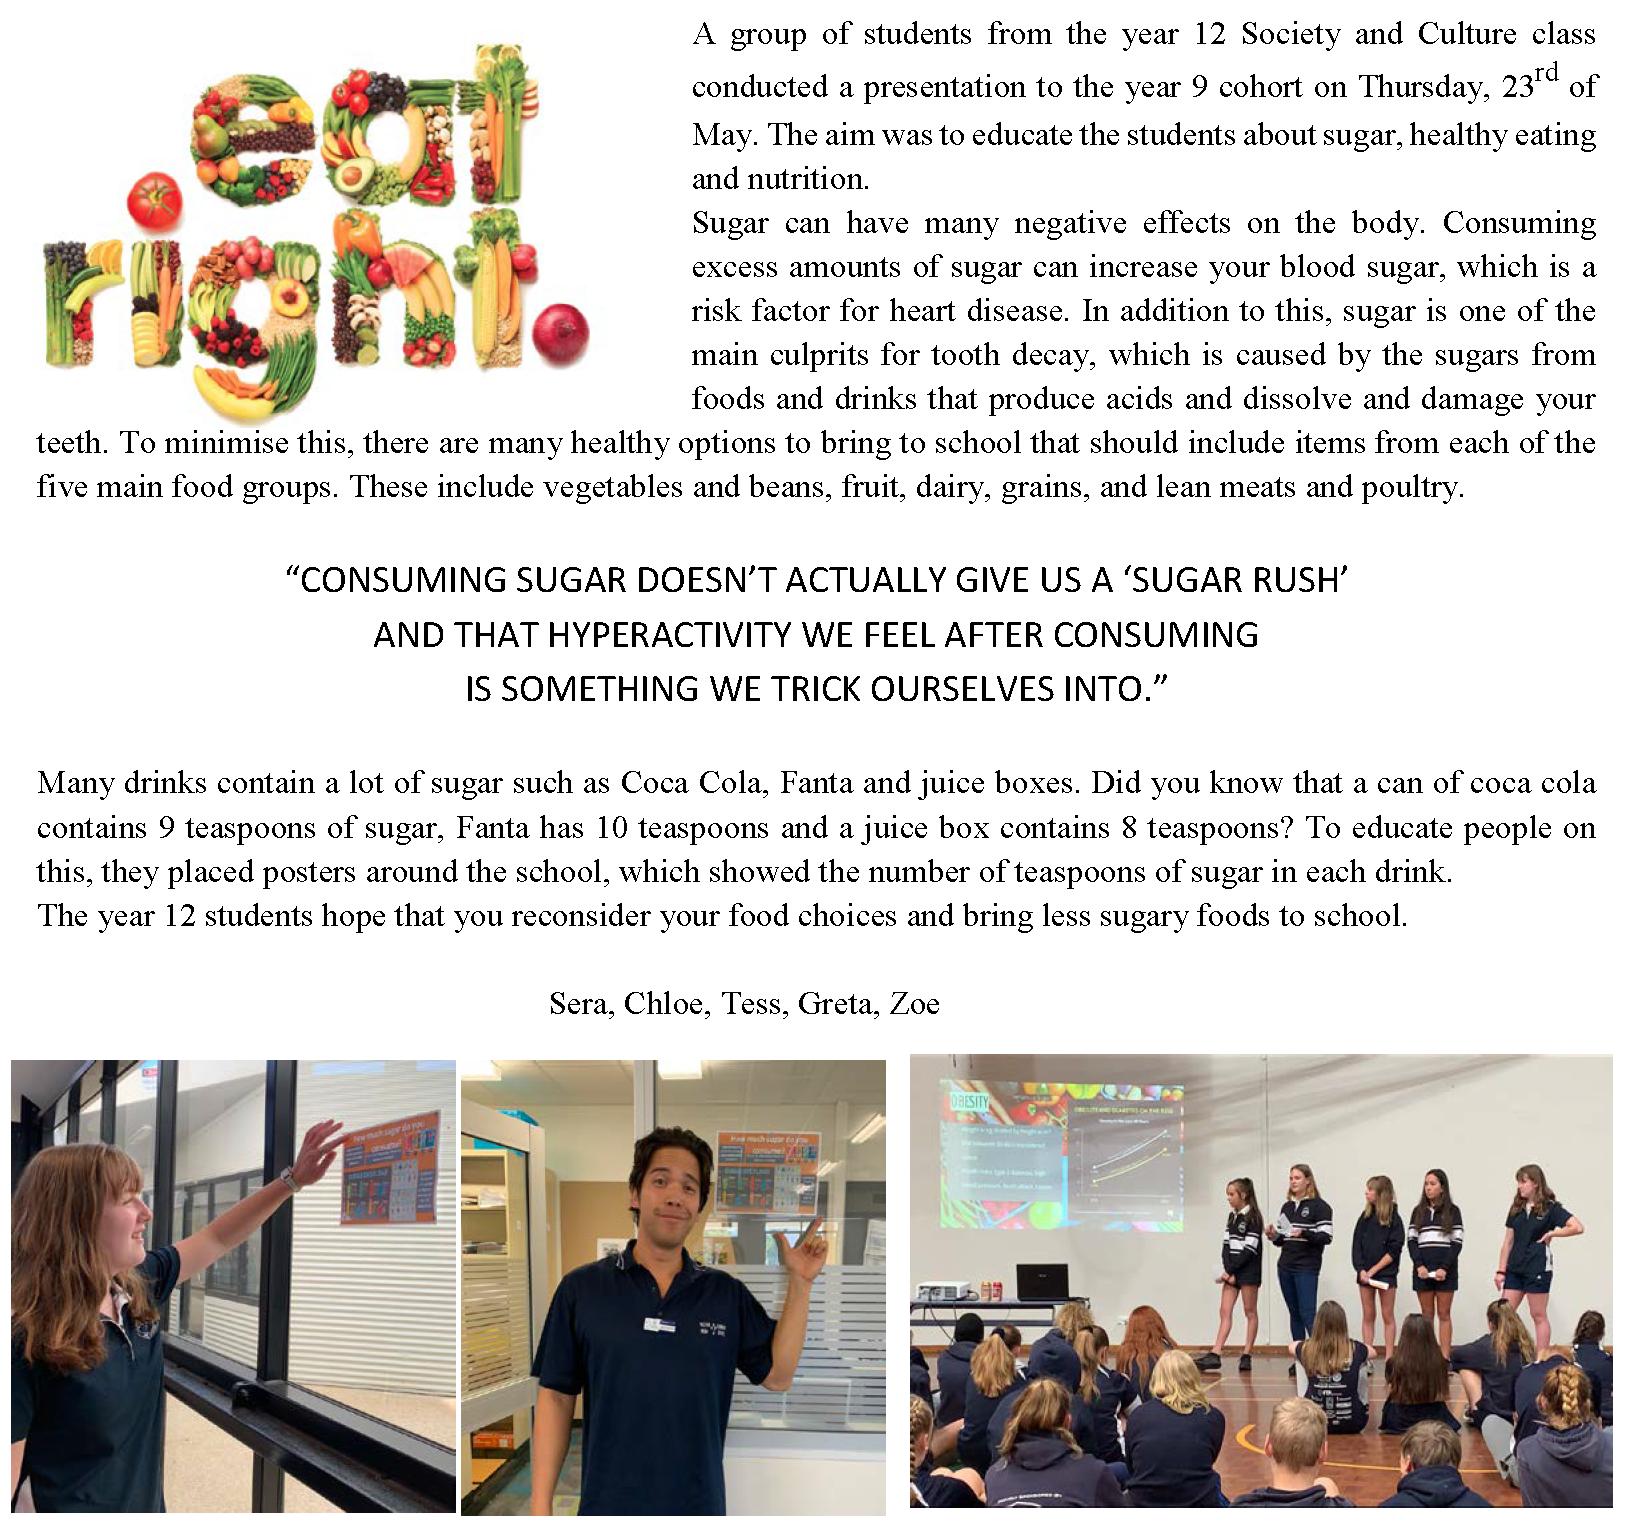 Sugar Article SOCE 2019 07 05 web.png